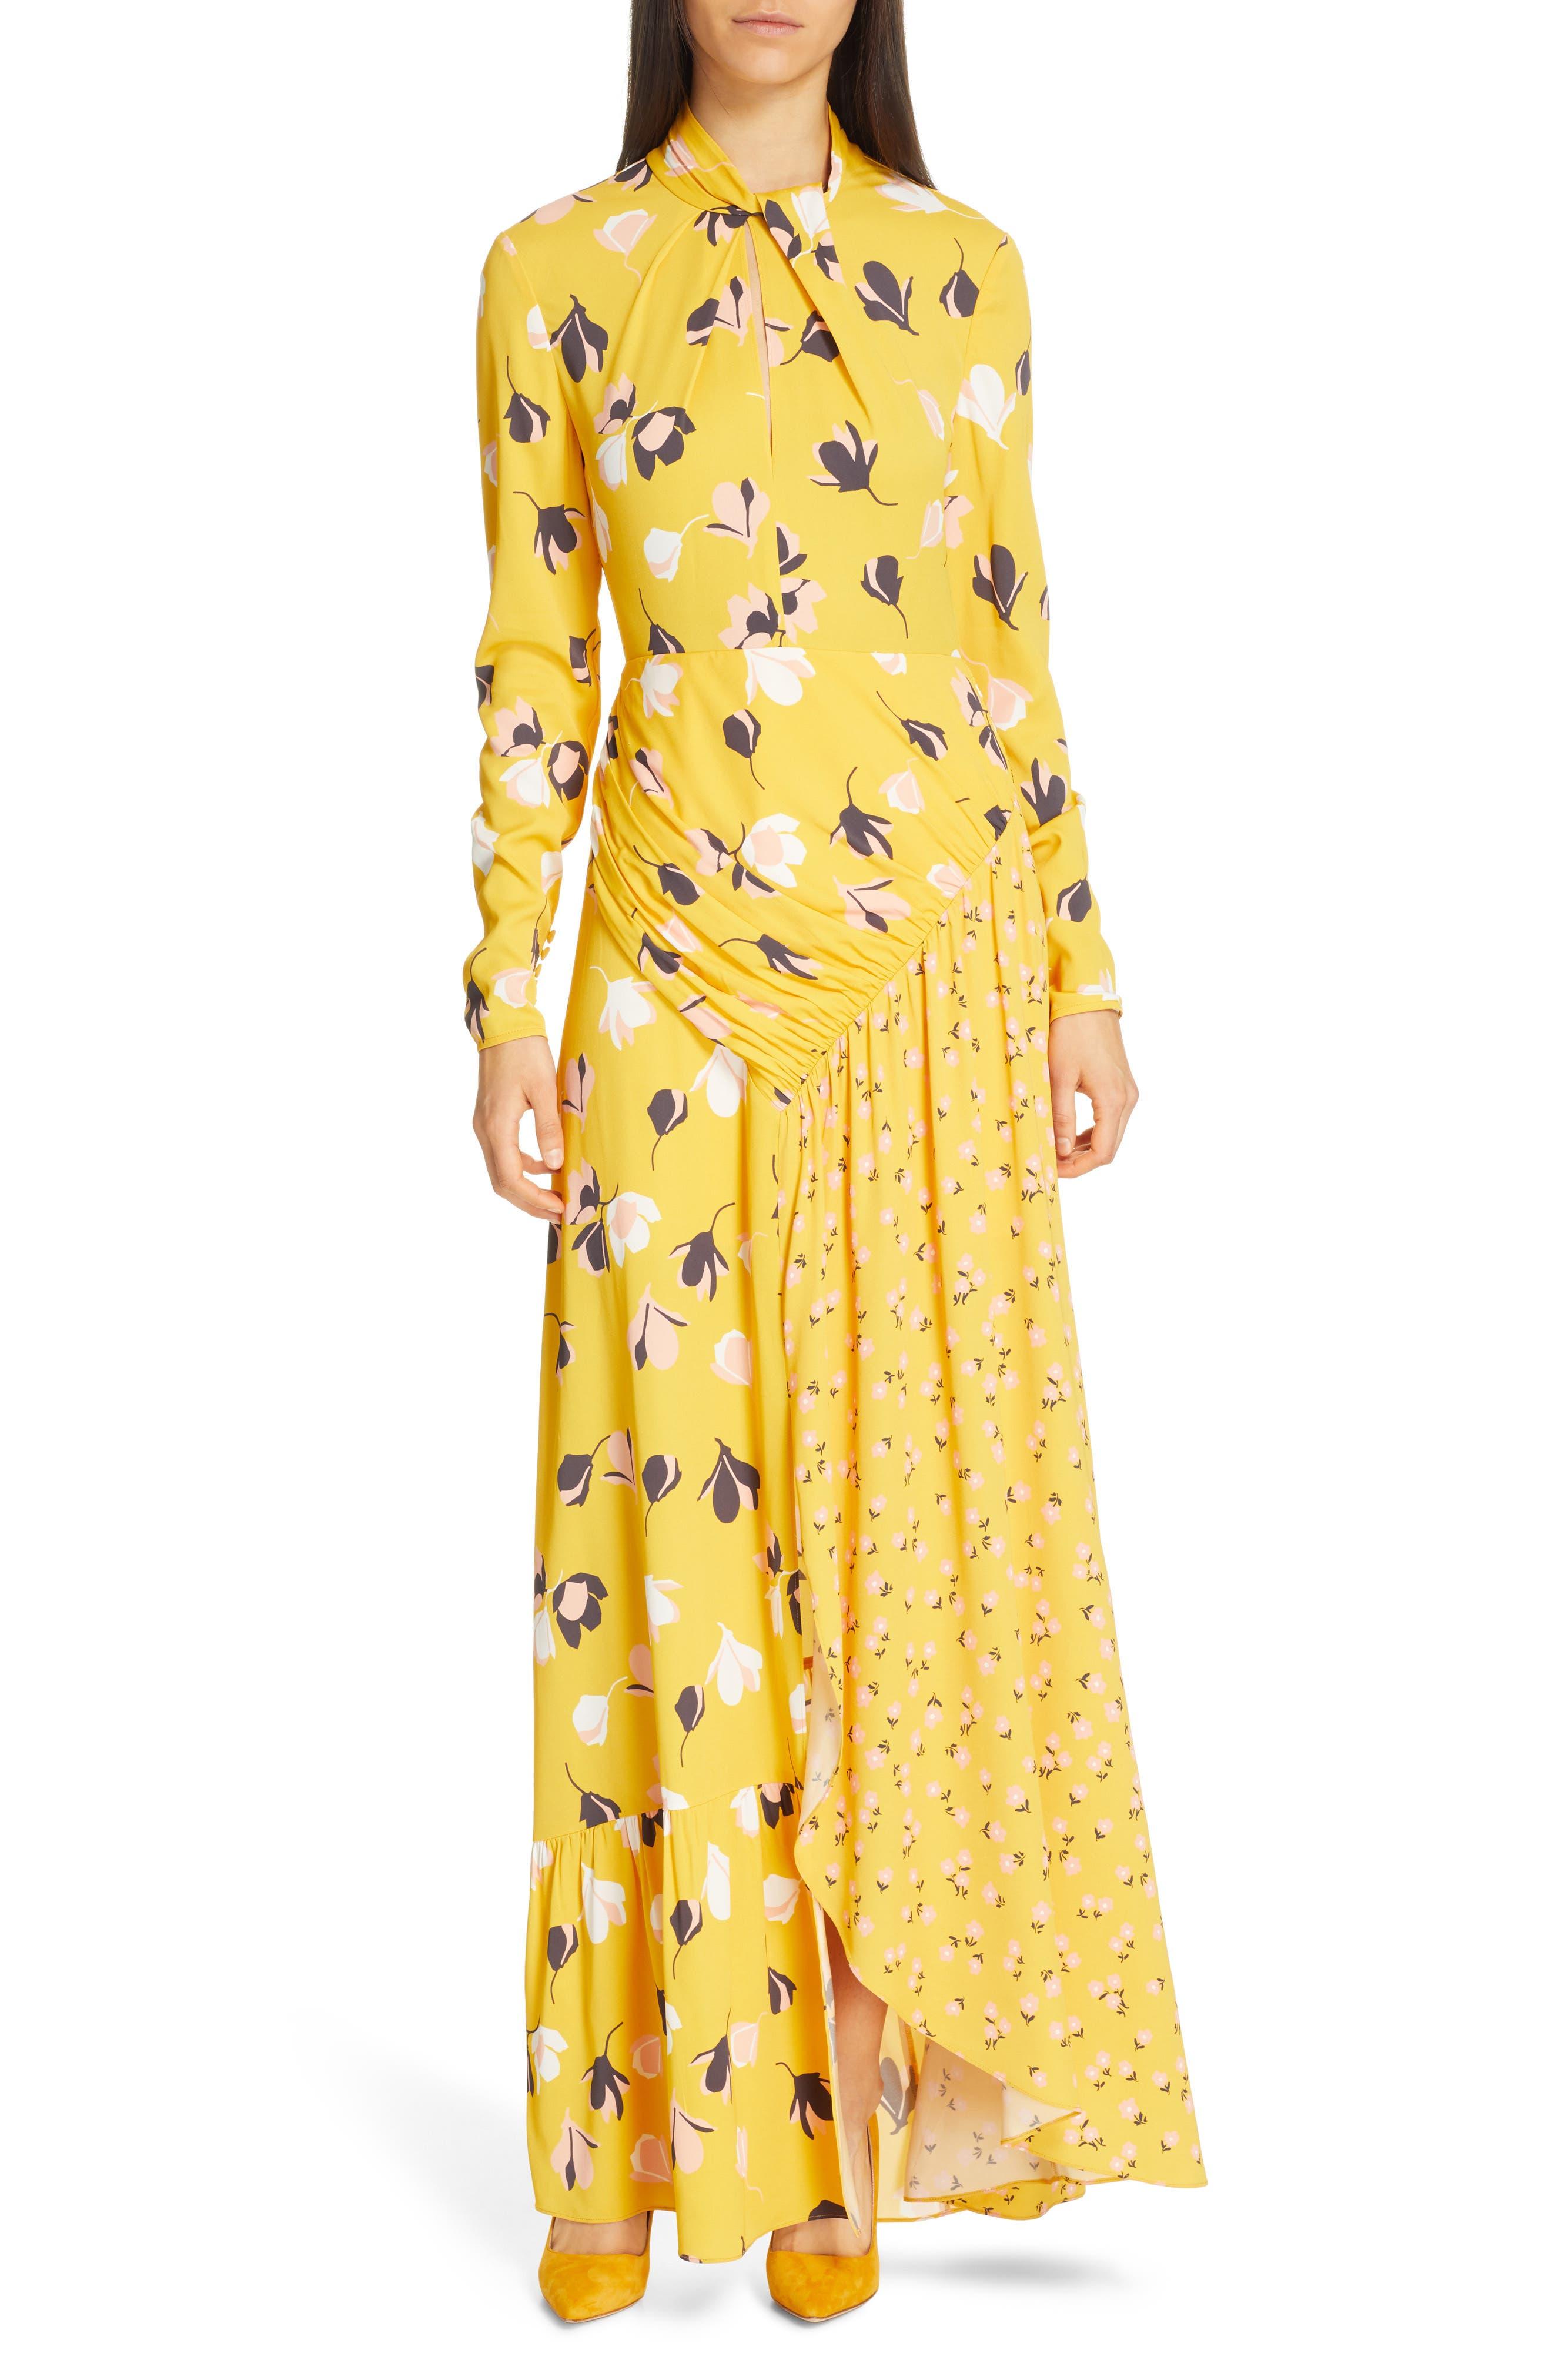 Self-Portrait Floral Print Twist Neck Long Sleeve Maxi Dress, Yellow